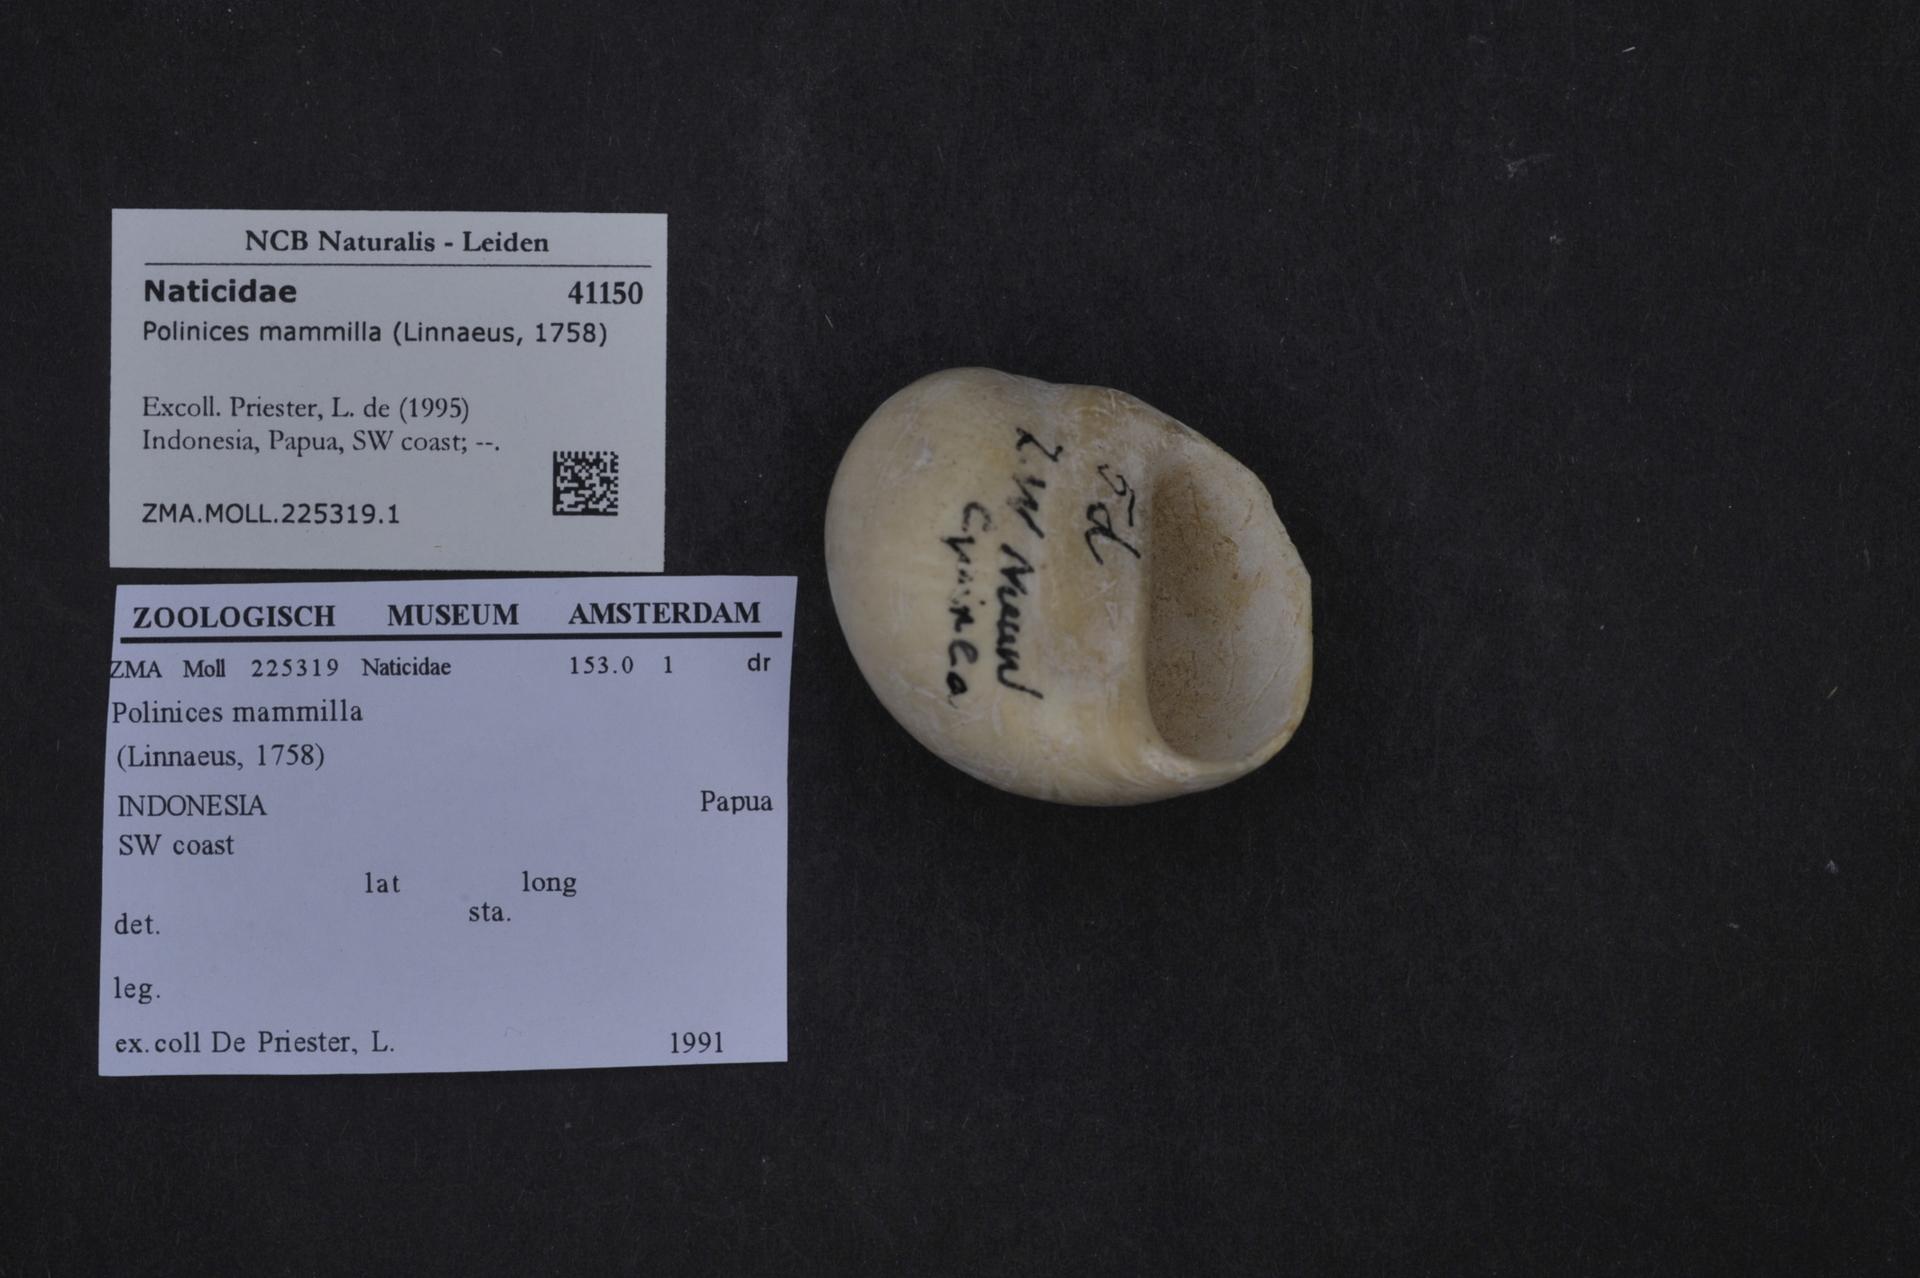 ZMA.MOLL.225319.1 | Polinices mammilla (Linnaeus, 1758)